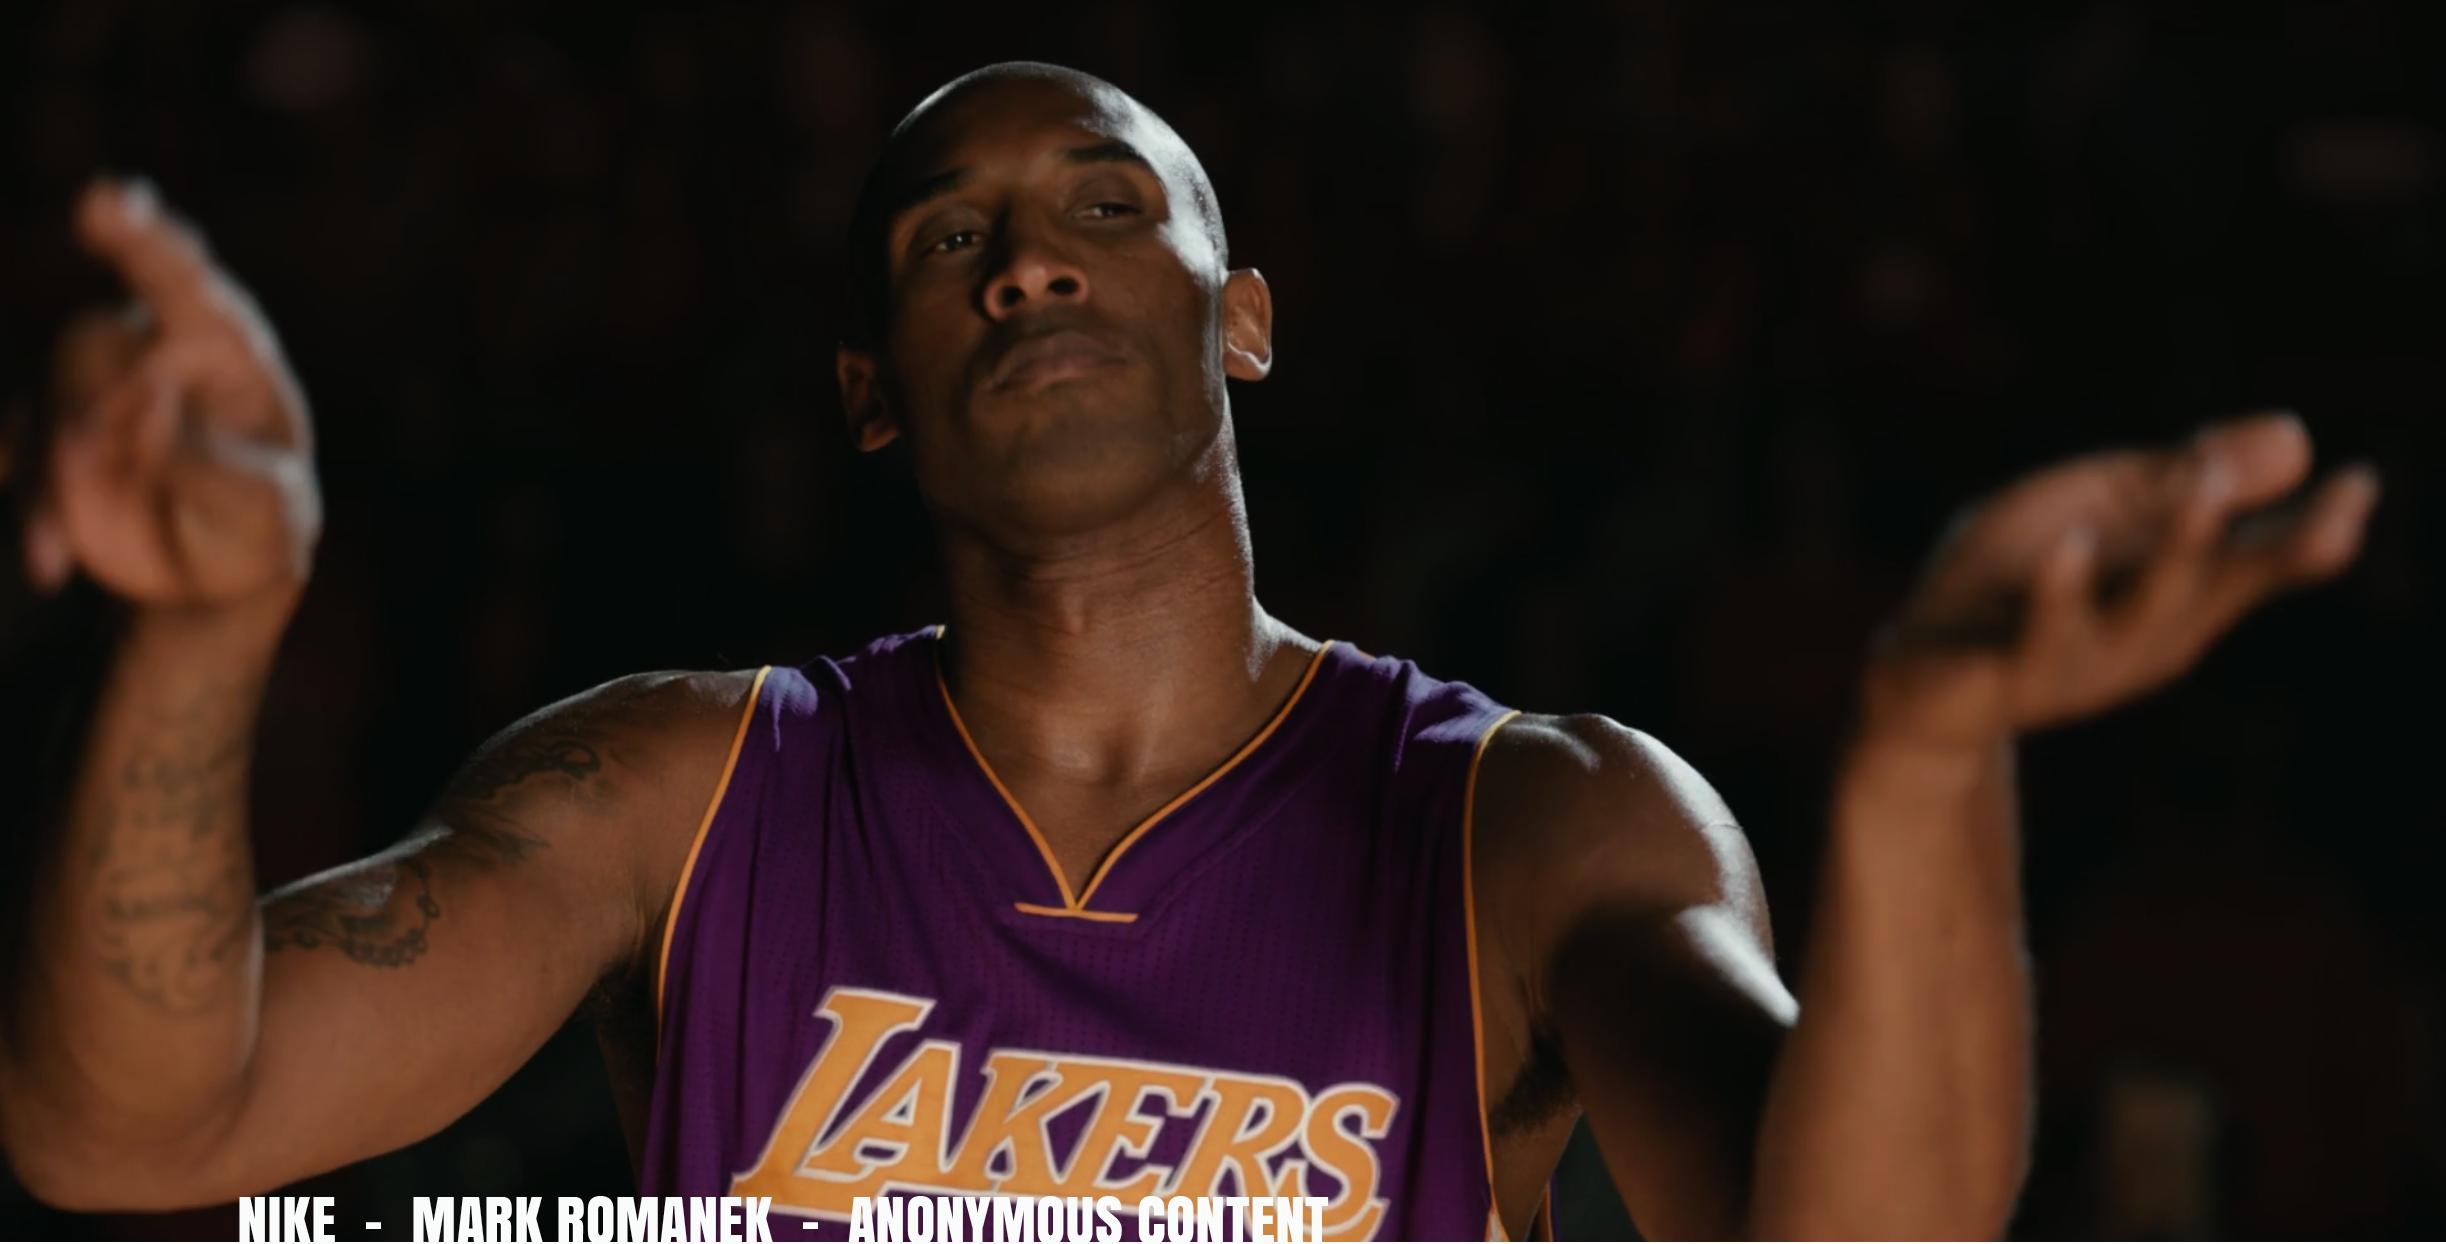 Nike Kobe - Dir. Mark Romanek